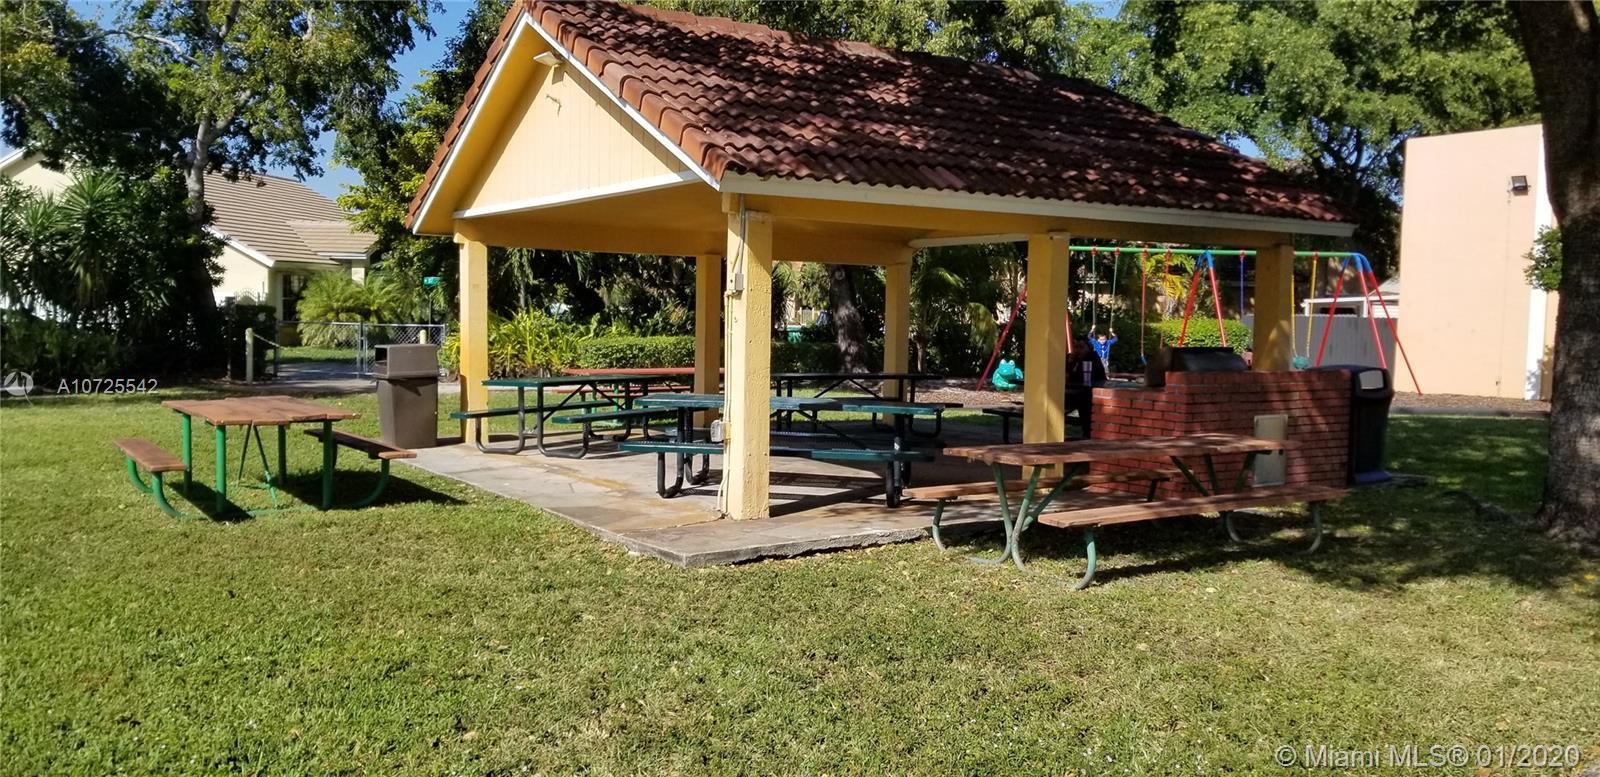 Country Lake Park # - 11 - photo